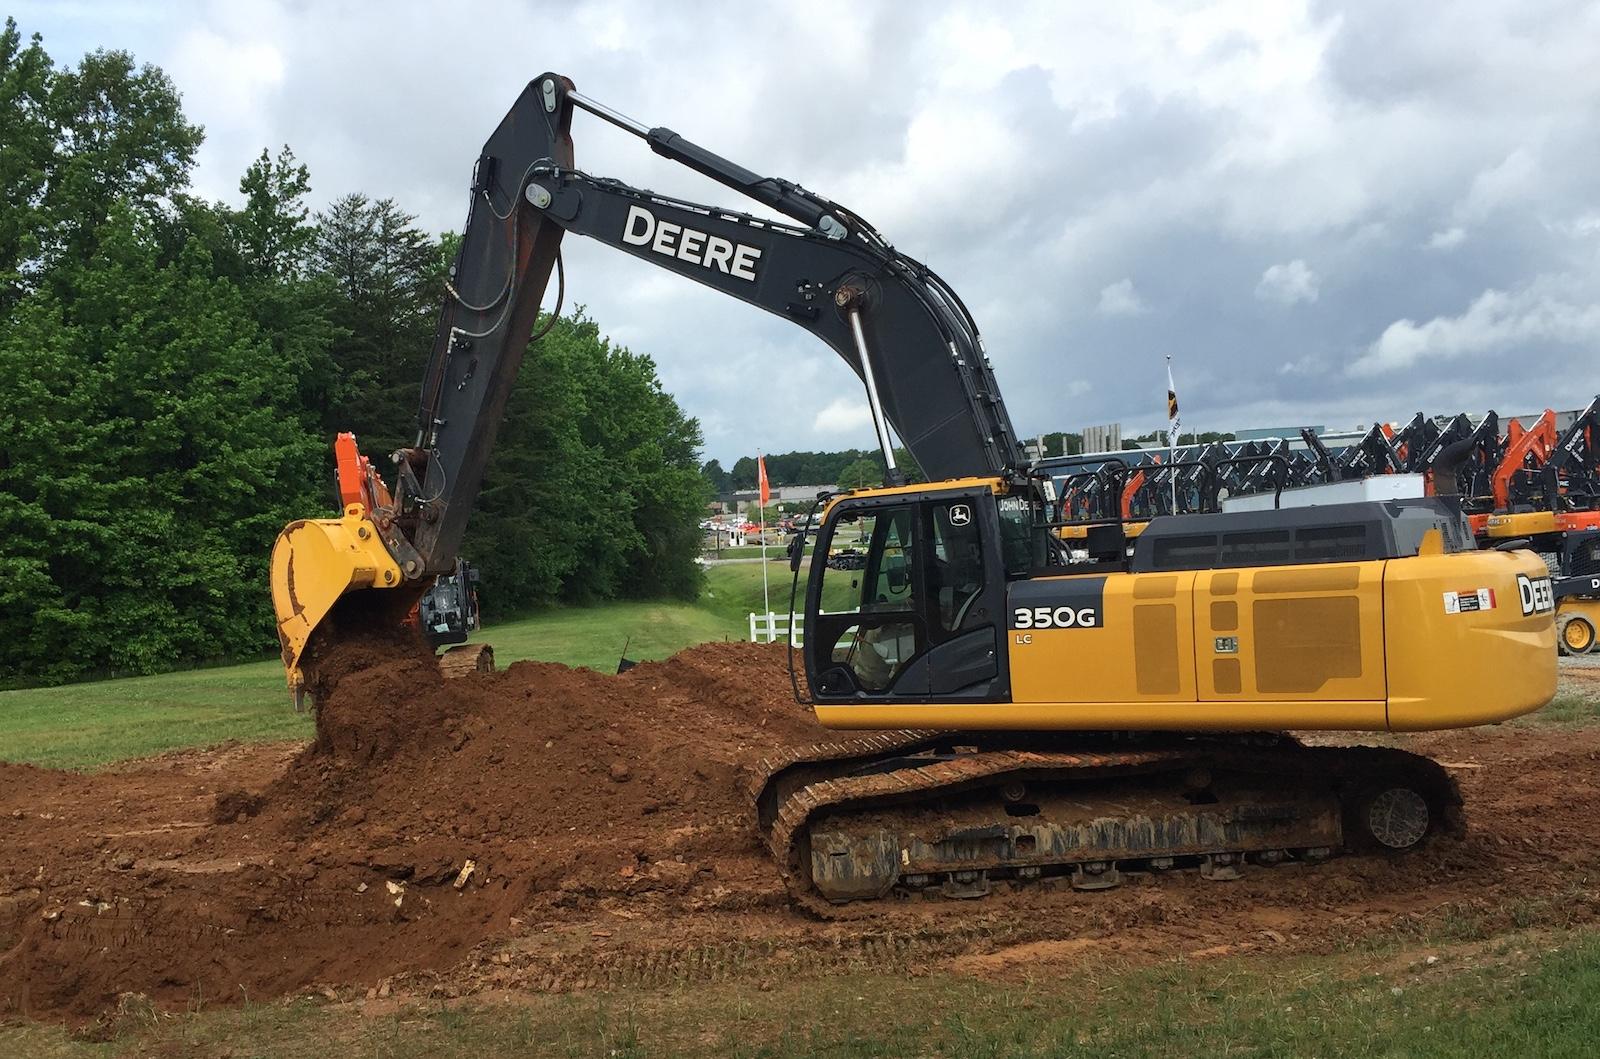 Deere demonstrated grade guidance on the 350G excavator